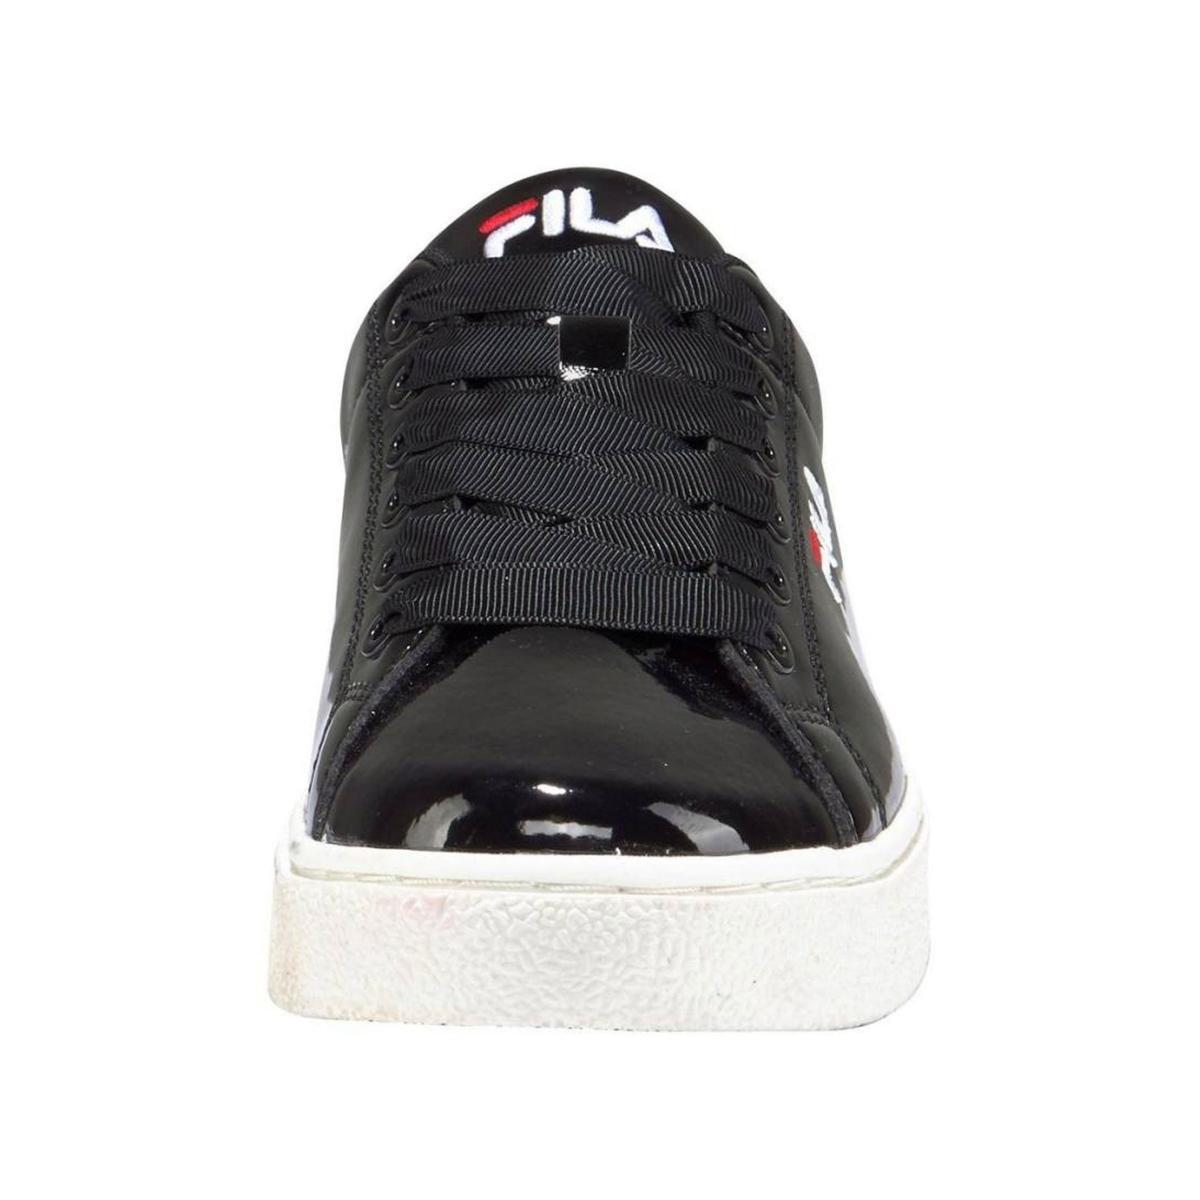 Scarpe Sneakers FILA UPSTAGE F LOW WMN da donna rif. 1010470.25Y